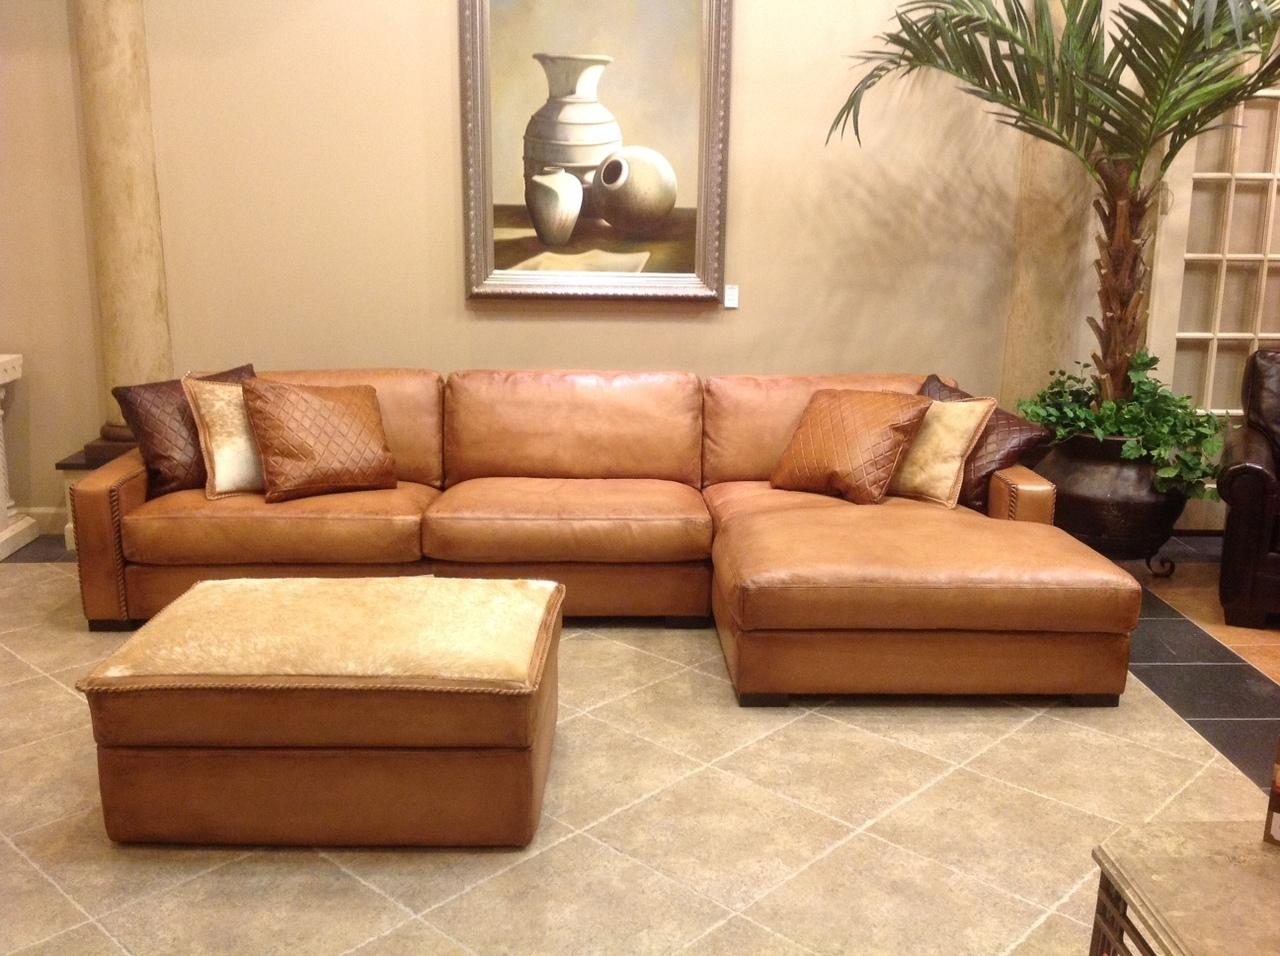 Sofa Comfortable Floor Seating 14 Of 15 Photos